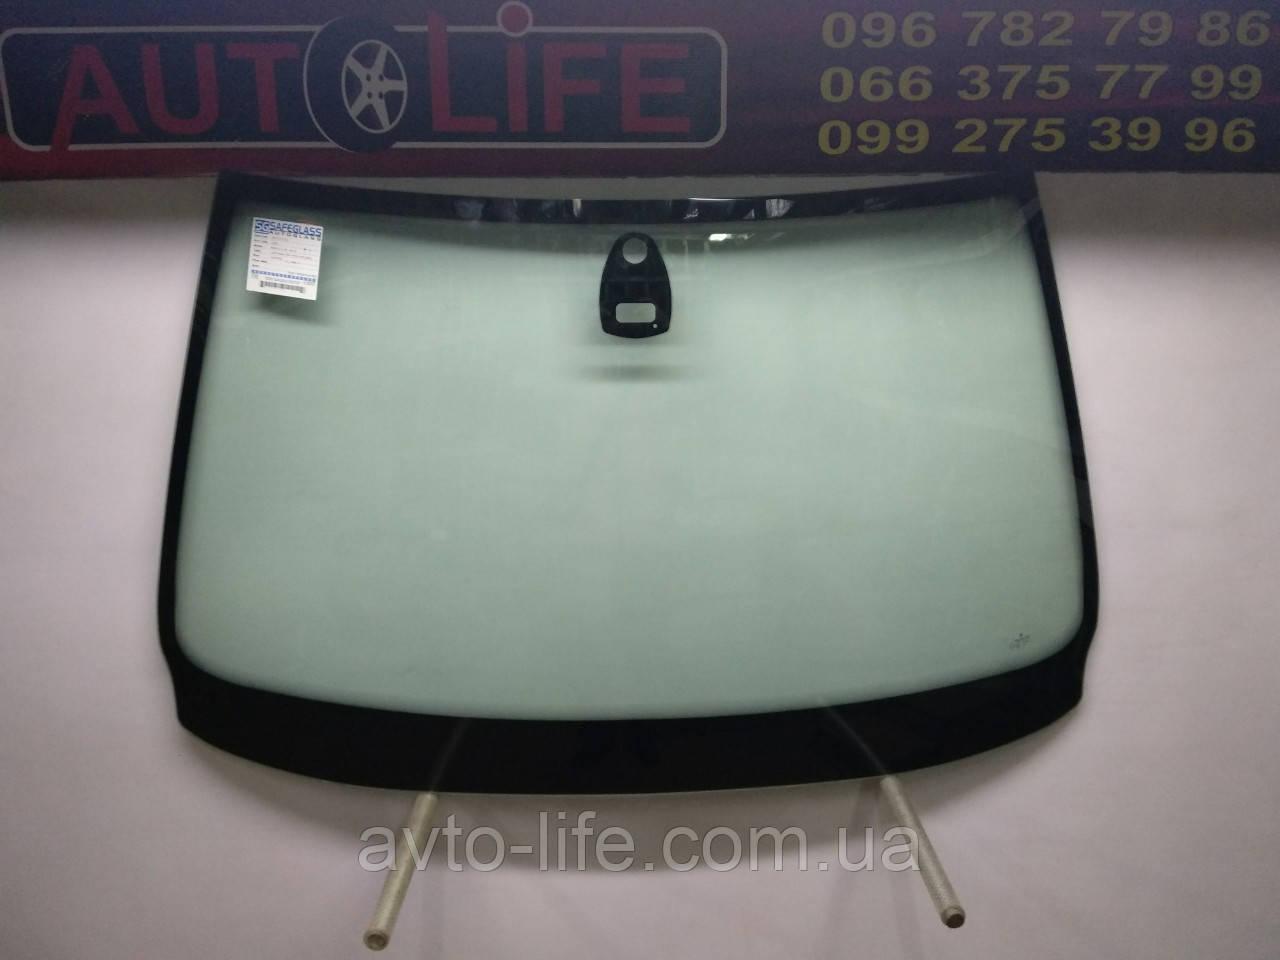 Лобовое стекло BMW 5 E39 (1995-2004) | Автостекло BMW 5 Е39 | Лобове скло БМВ 5 Е39 | Заміна лобового скла